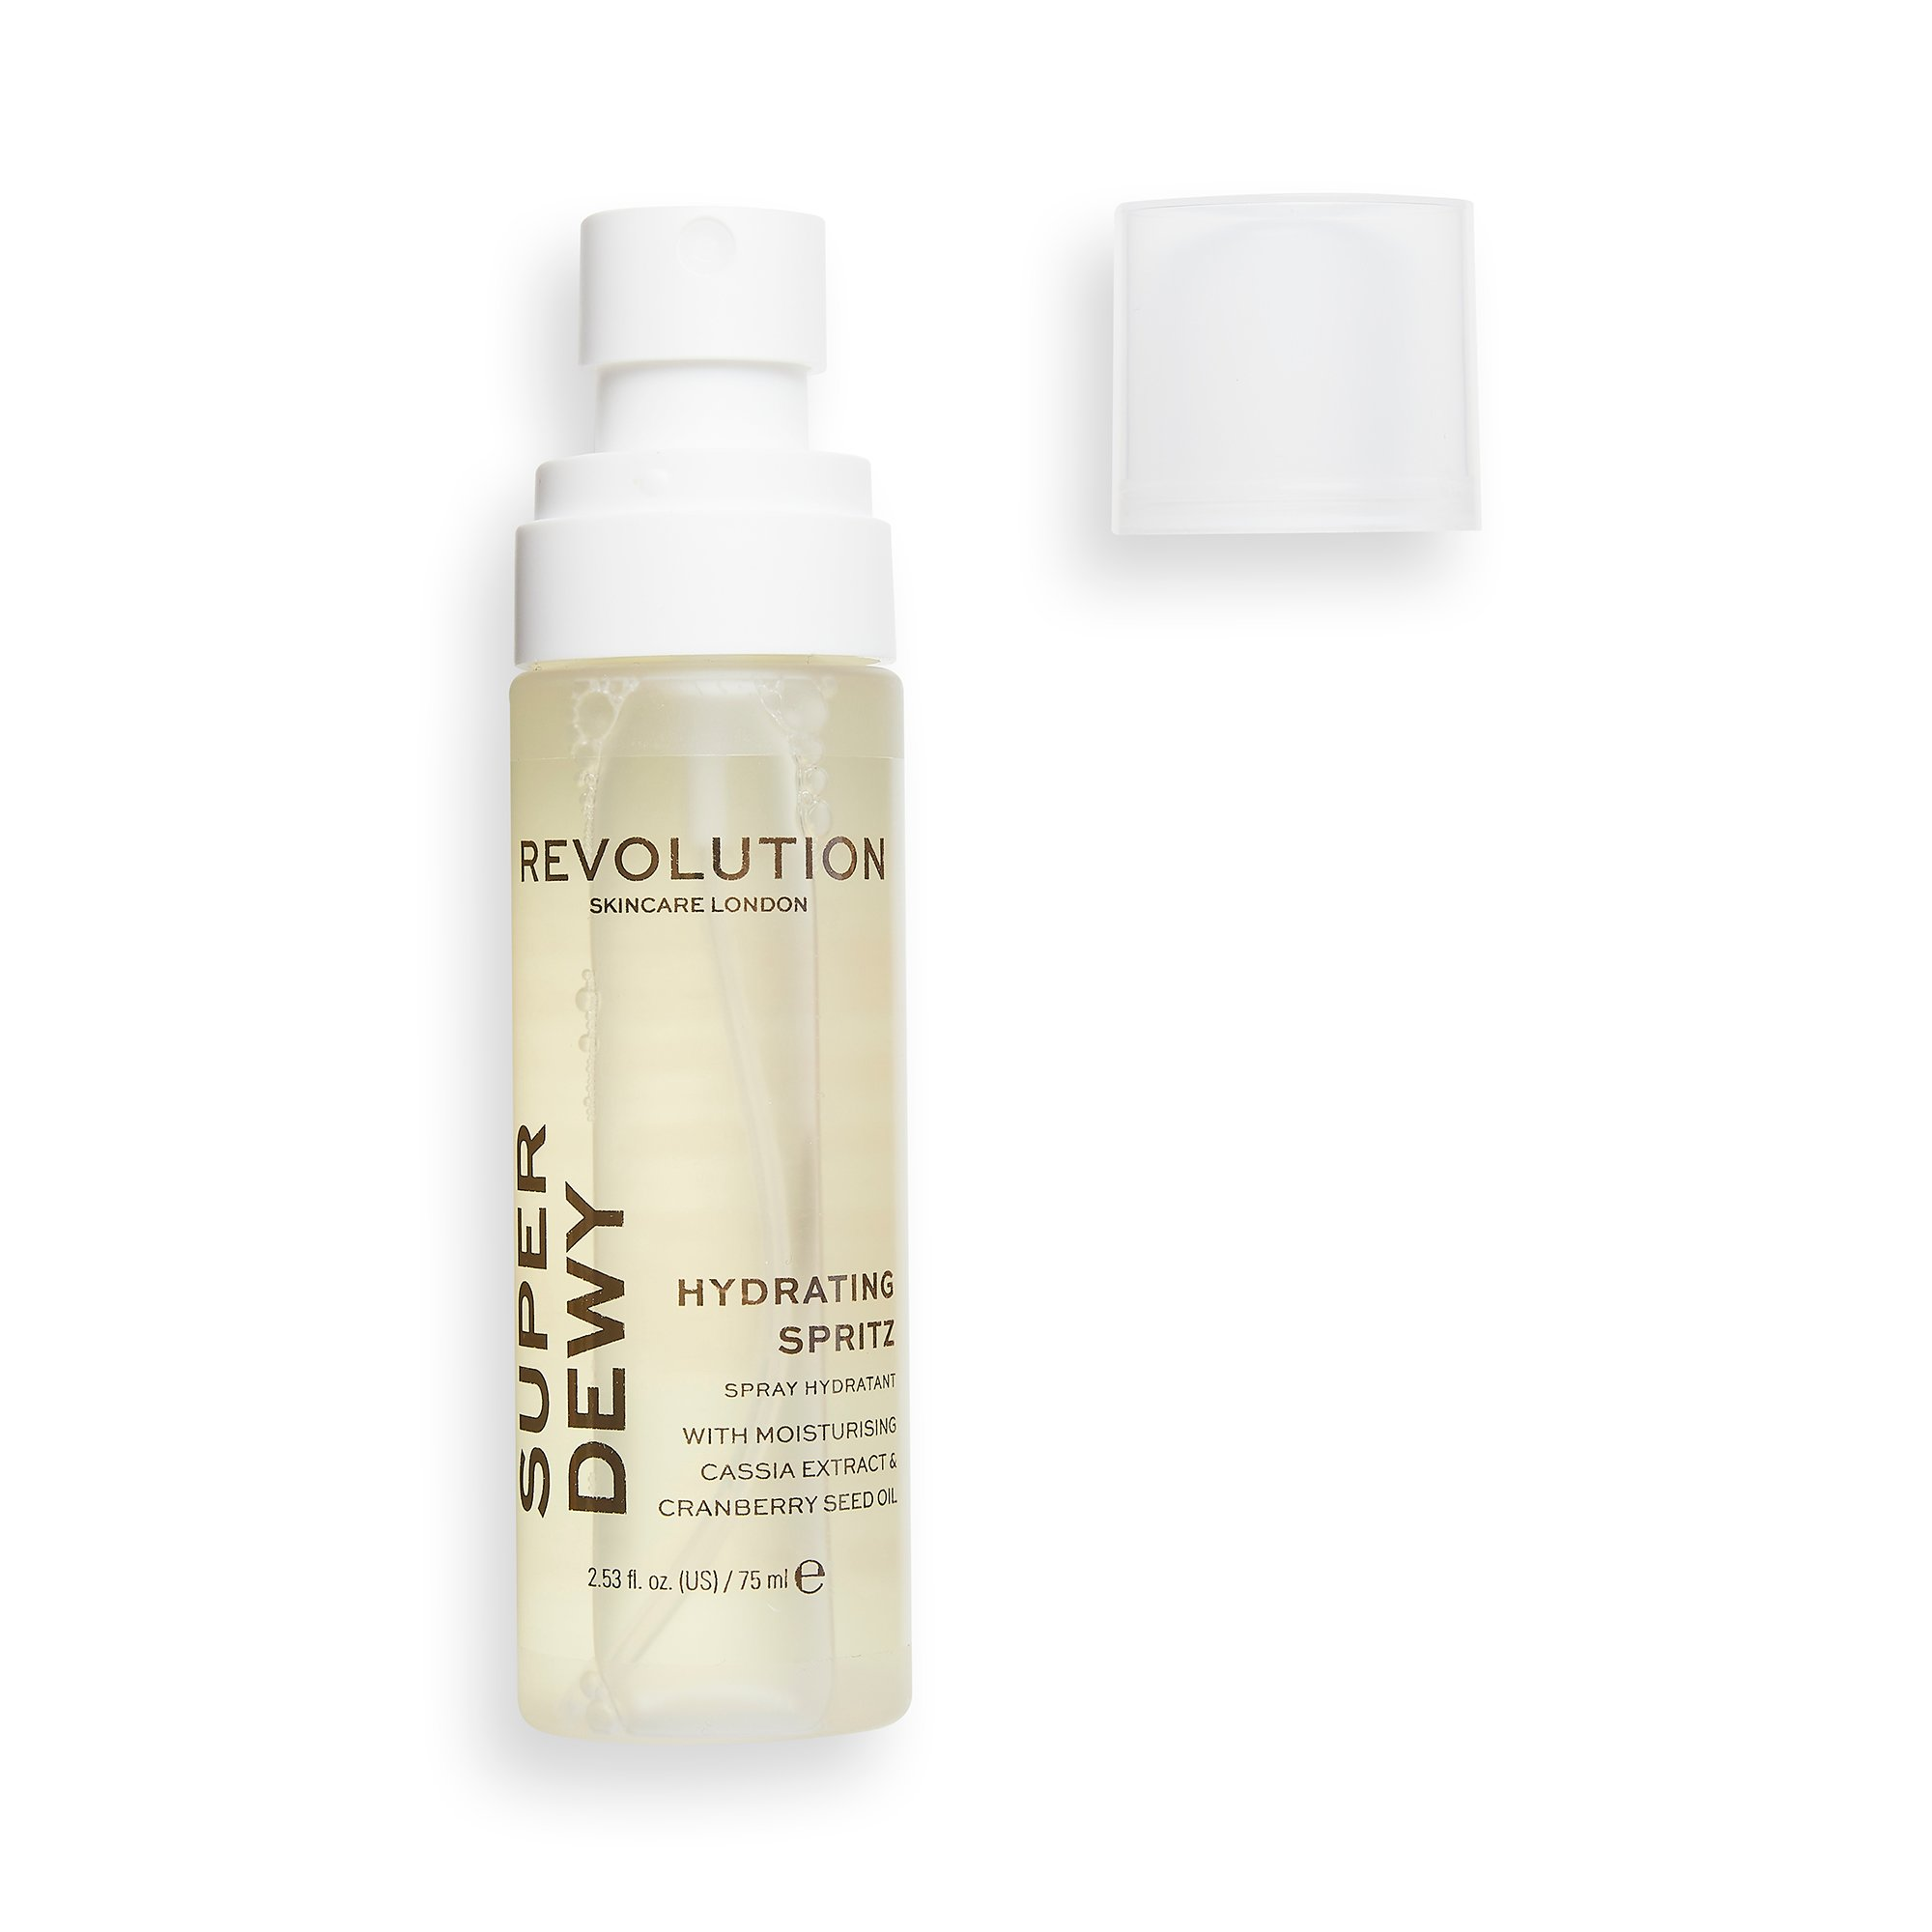 Revolution Skincare Superdewy Hydrating Spritz